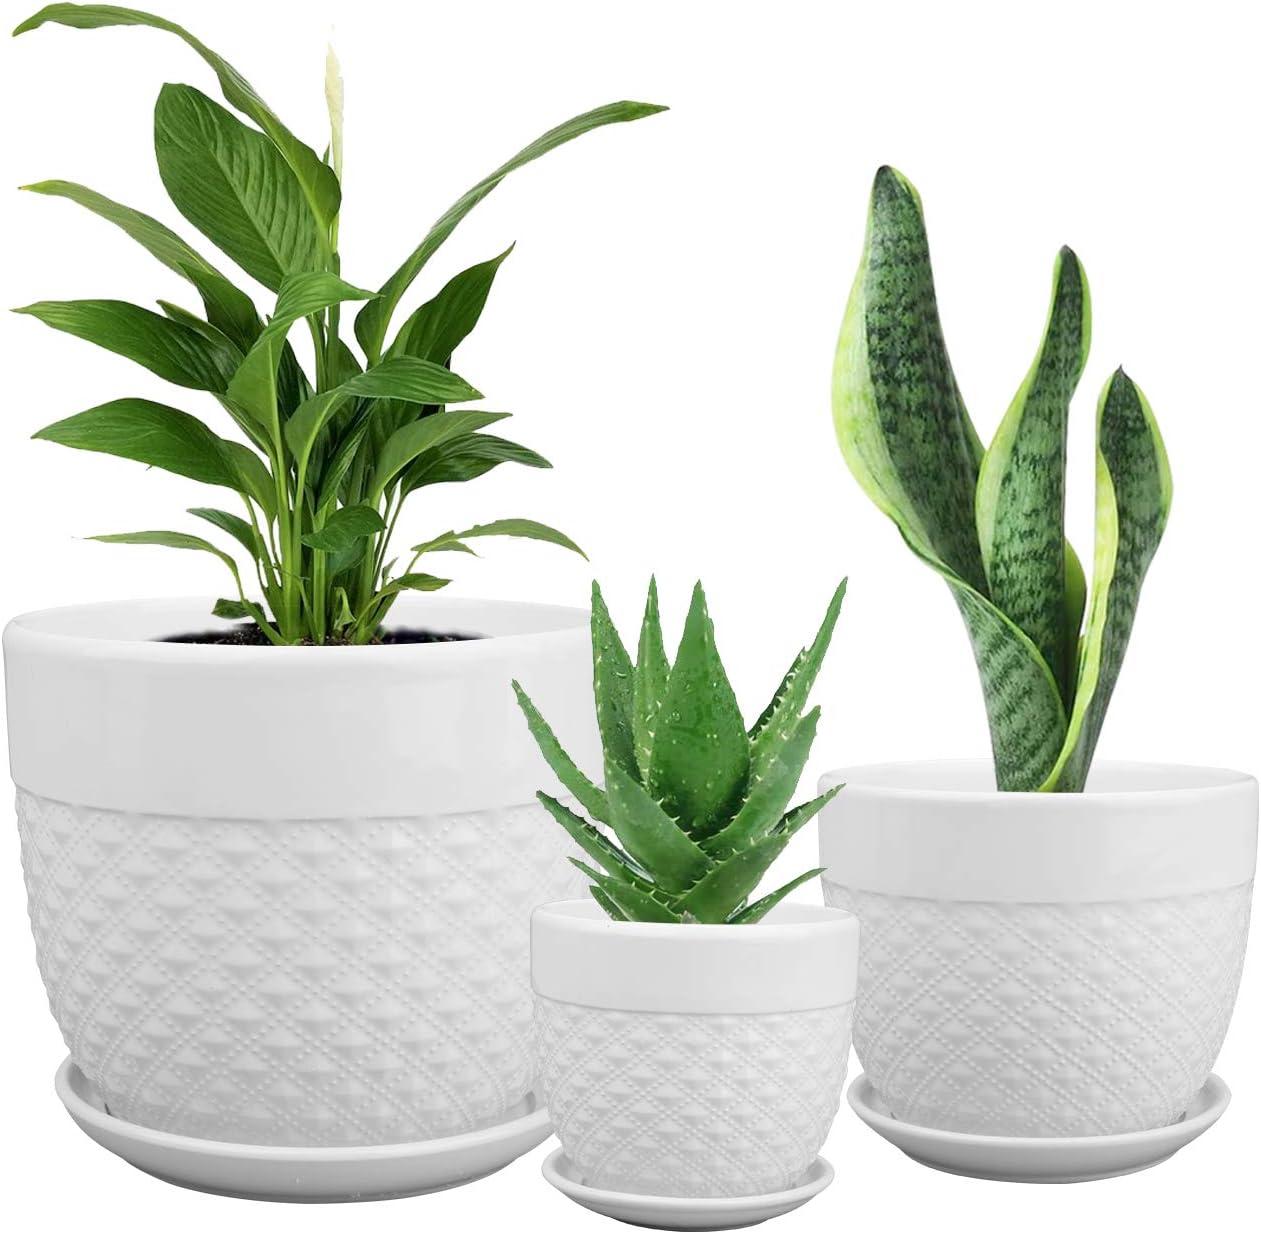 Brajttt Flower Pots, 3 PCS Pearl White Anti Slip- Glazed Ceramic Plant Pots with Drainage Hole & Saucers, S/M/L Sized Indoor & Outdoor Garden Planting and Succulent Pots- Home Décor Tool